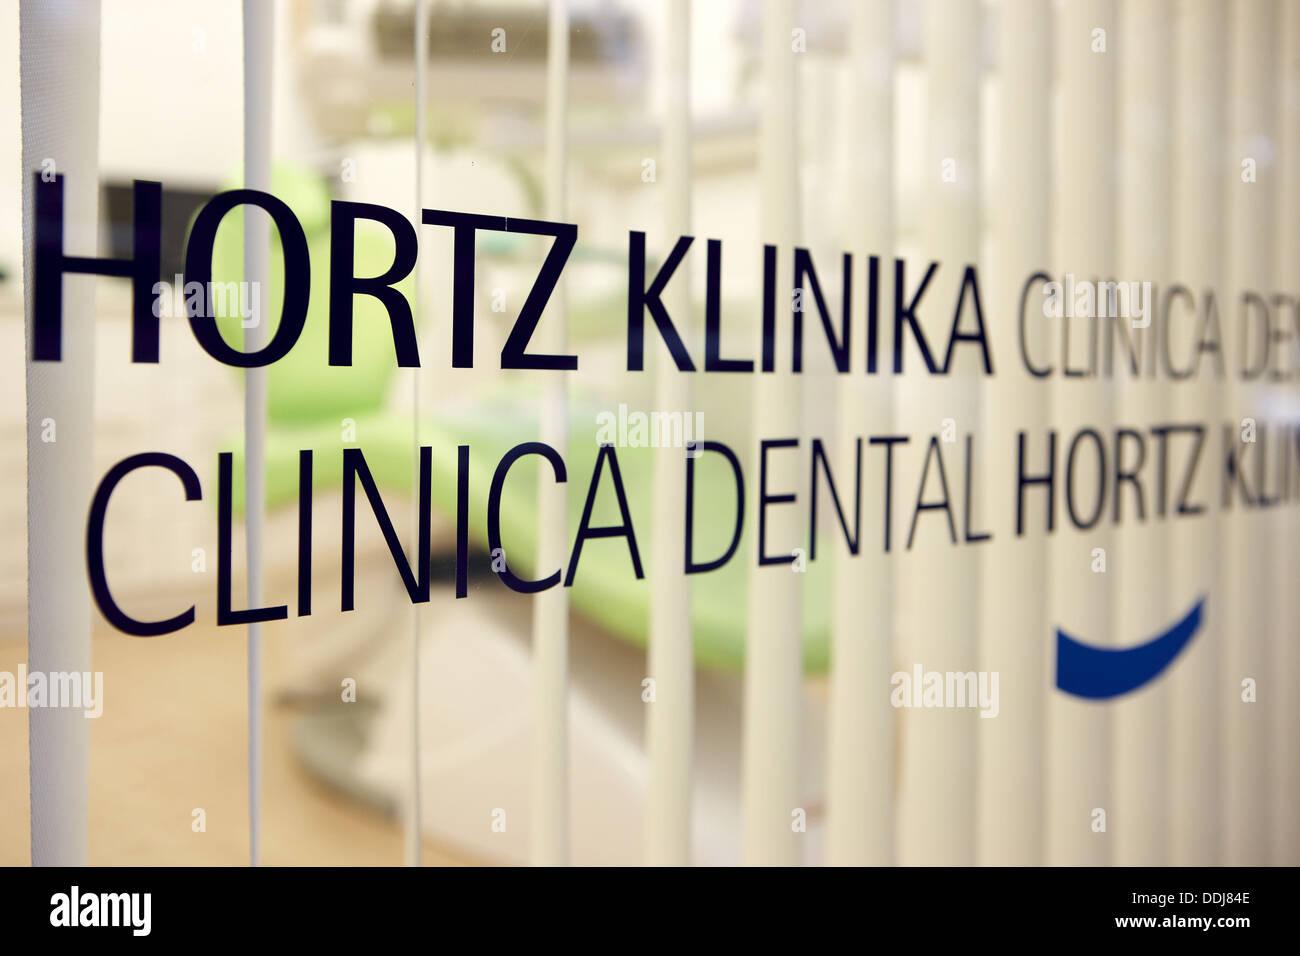 Dental clinic - Stock Image